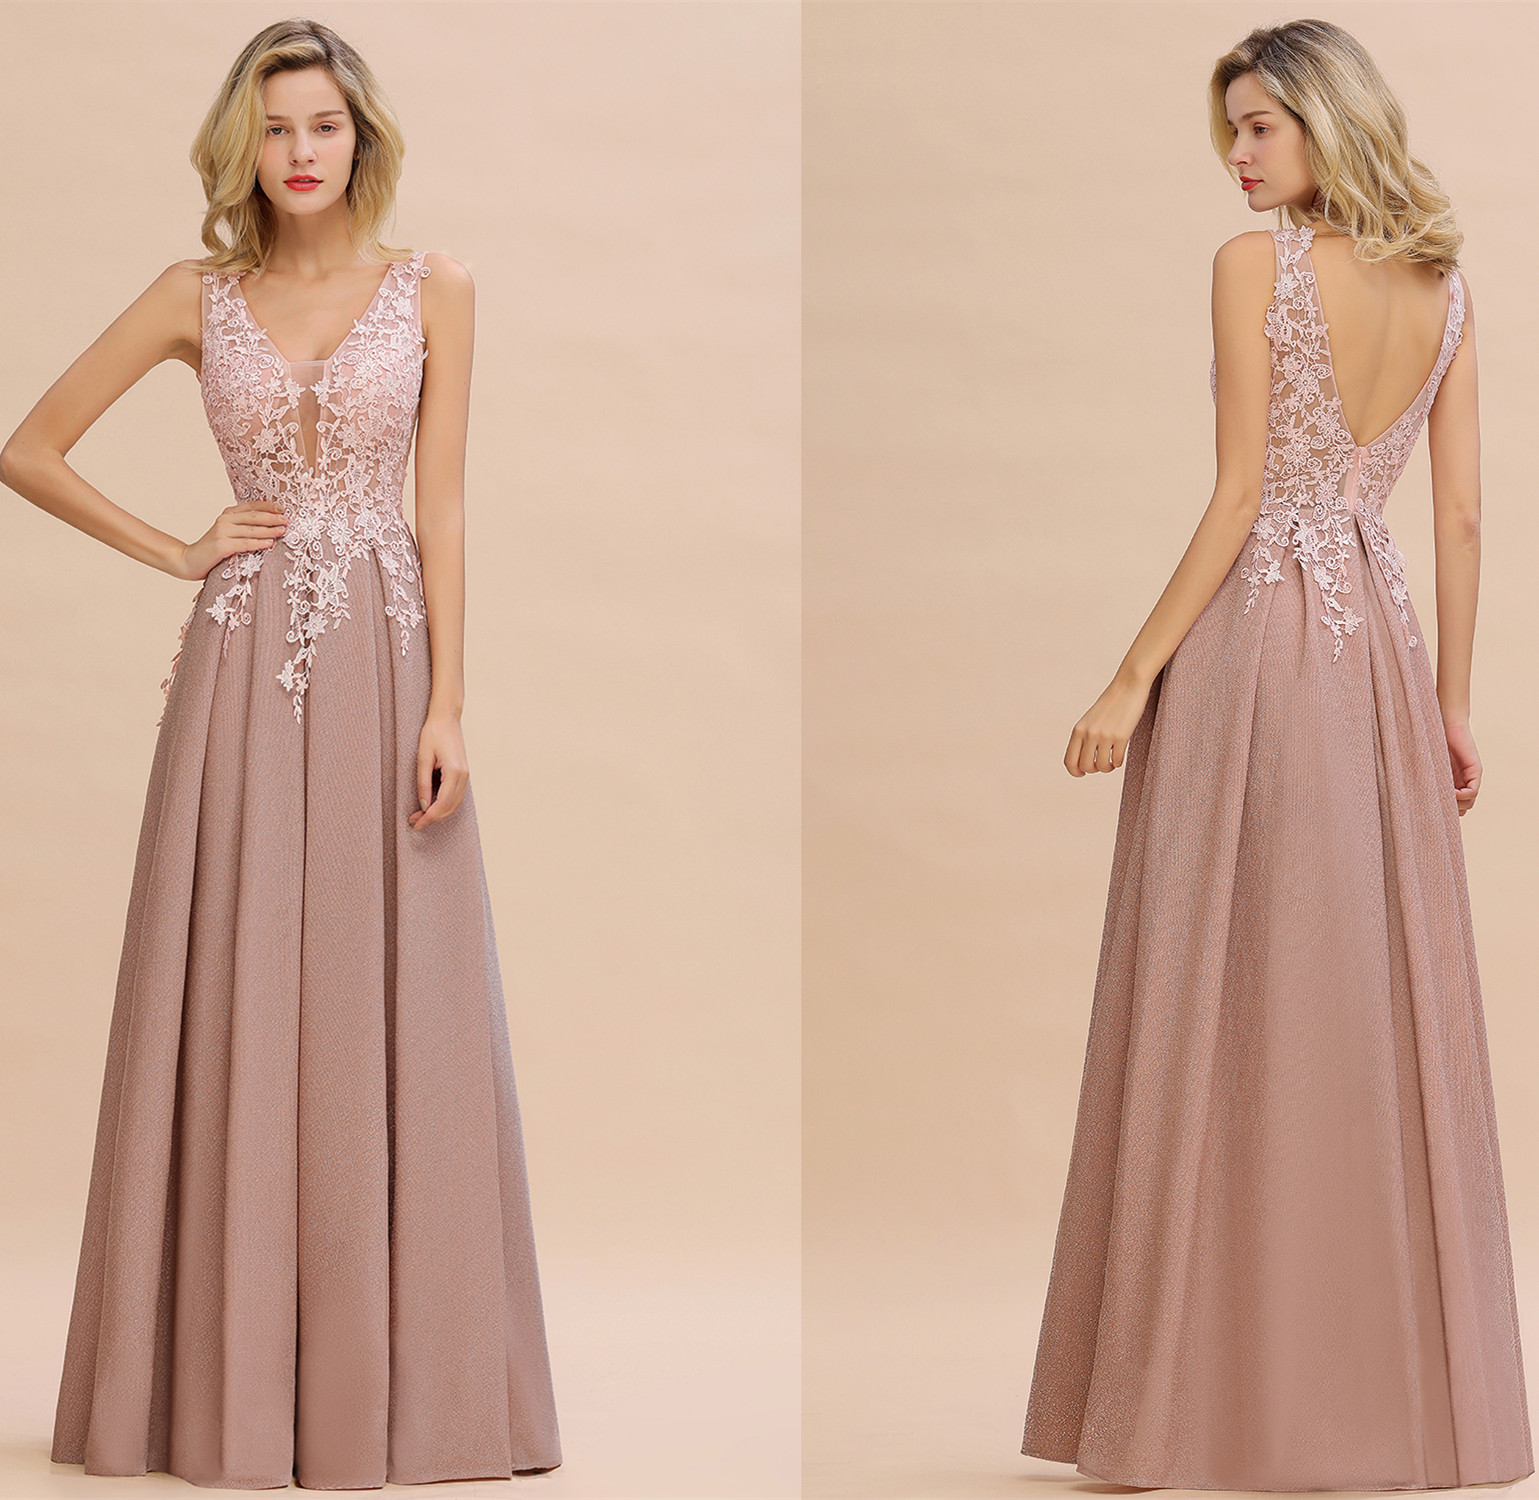 Dust Pink Sleeveless Long Evening Dress Elegant Lace Appliques Party Dress Sexy Backless A Line Party Gowns Vestidos De Novia